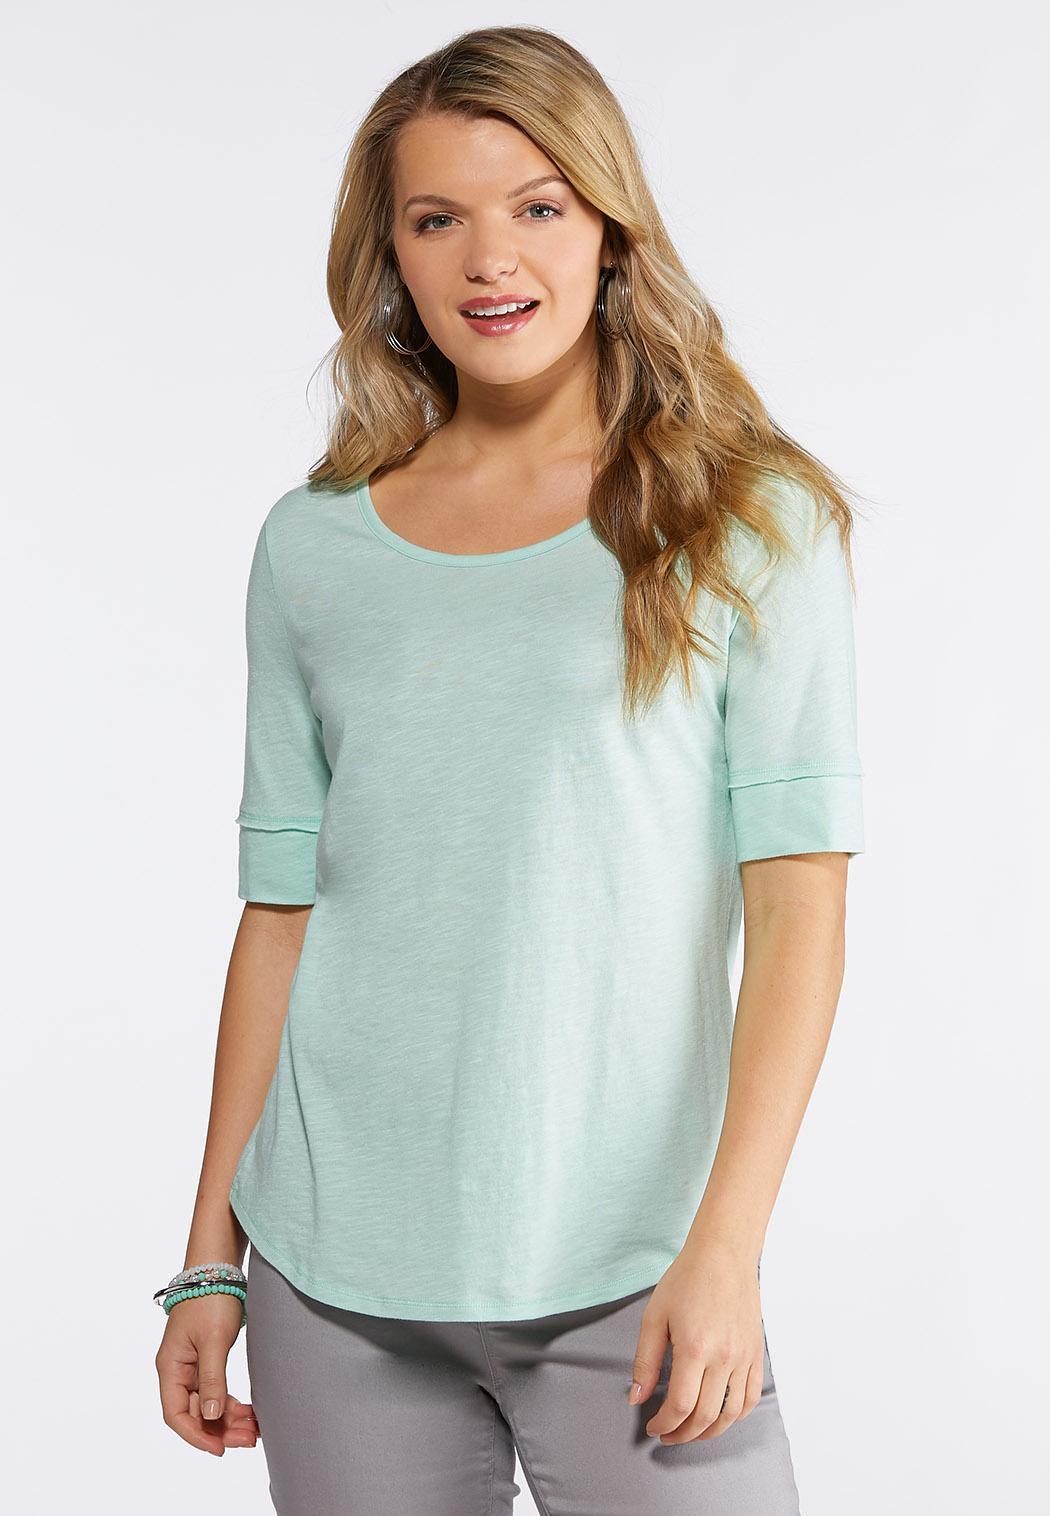 25f30ded Elbow Length T Shirt Plus Size   Top Mode Depot